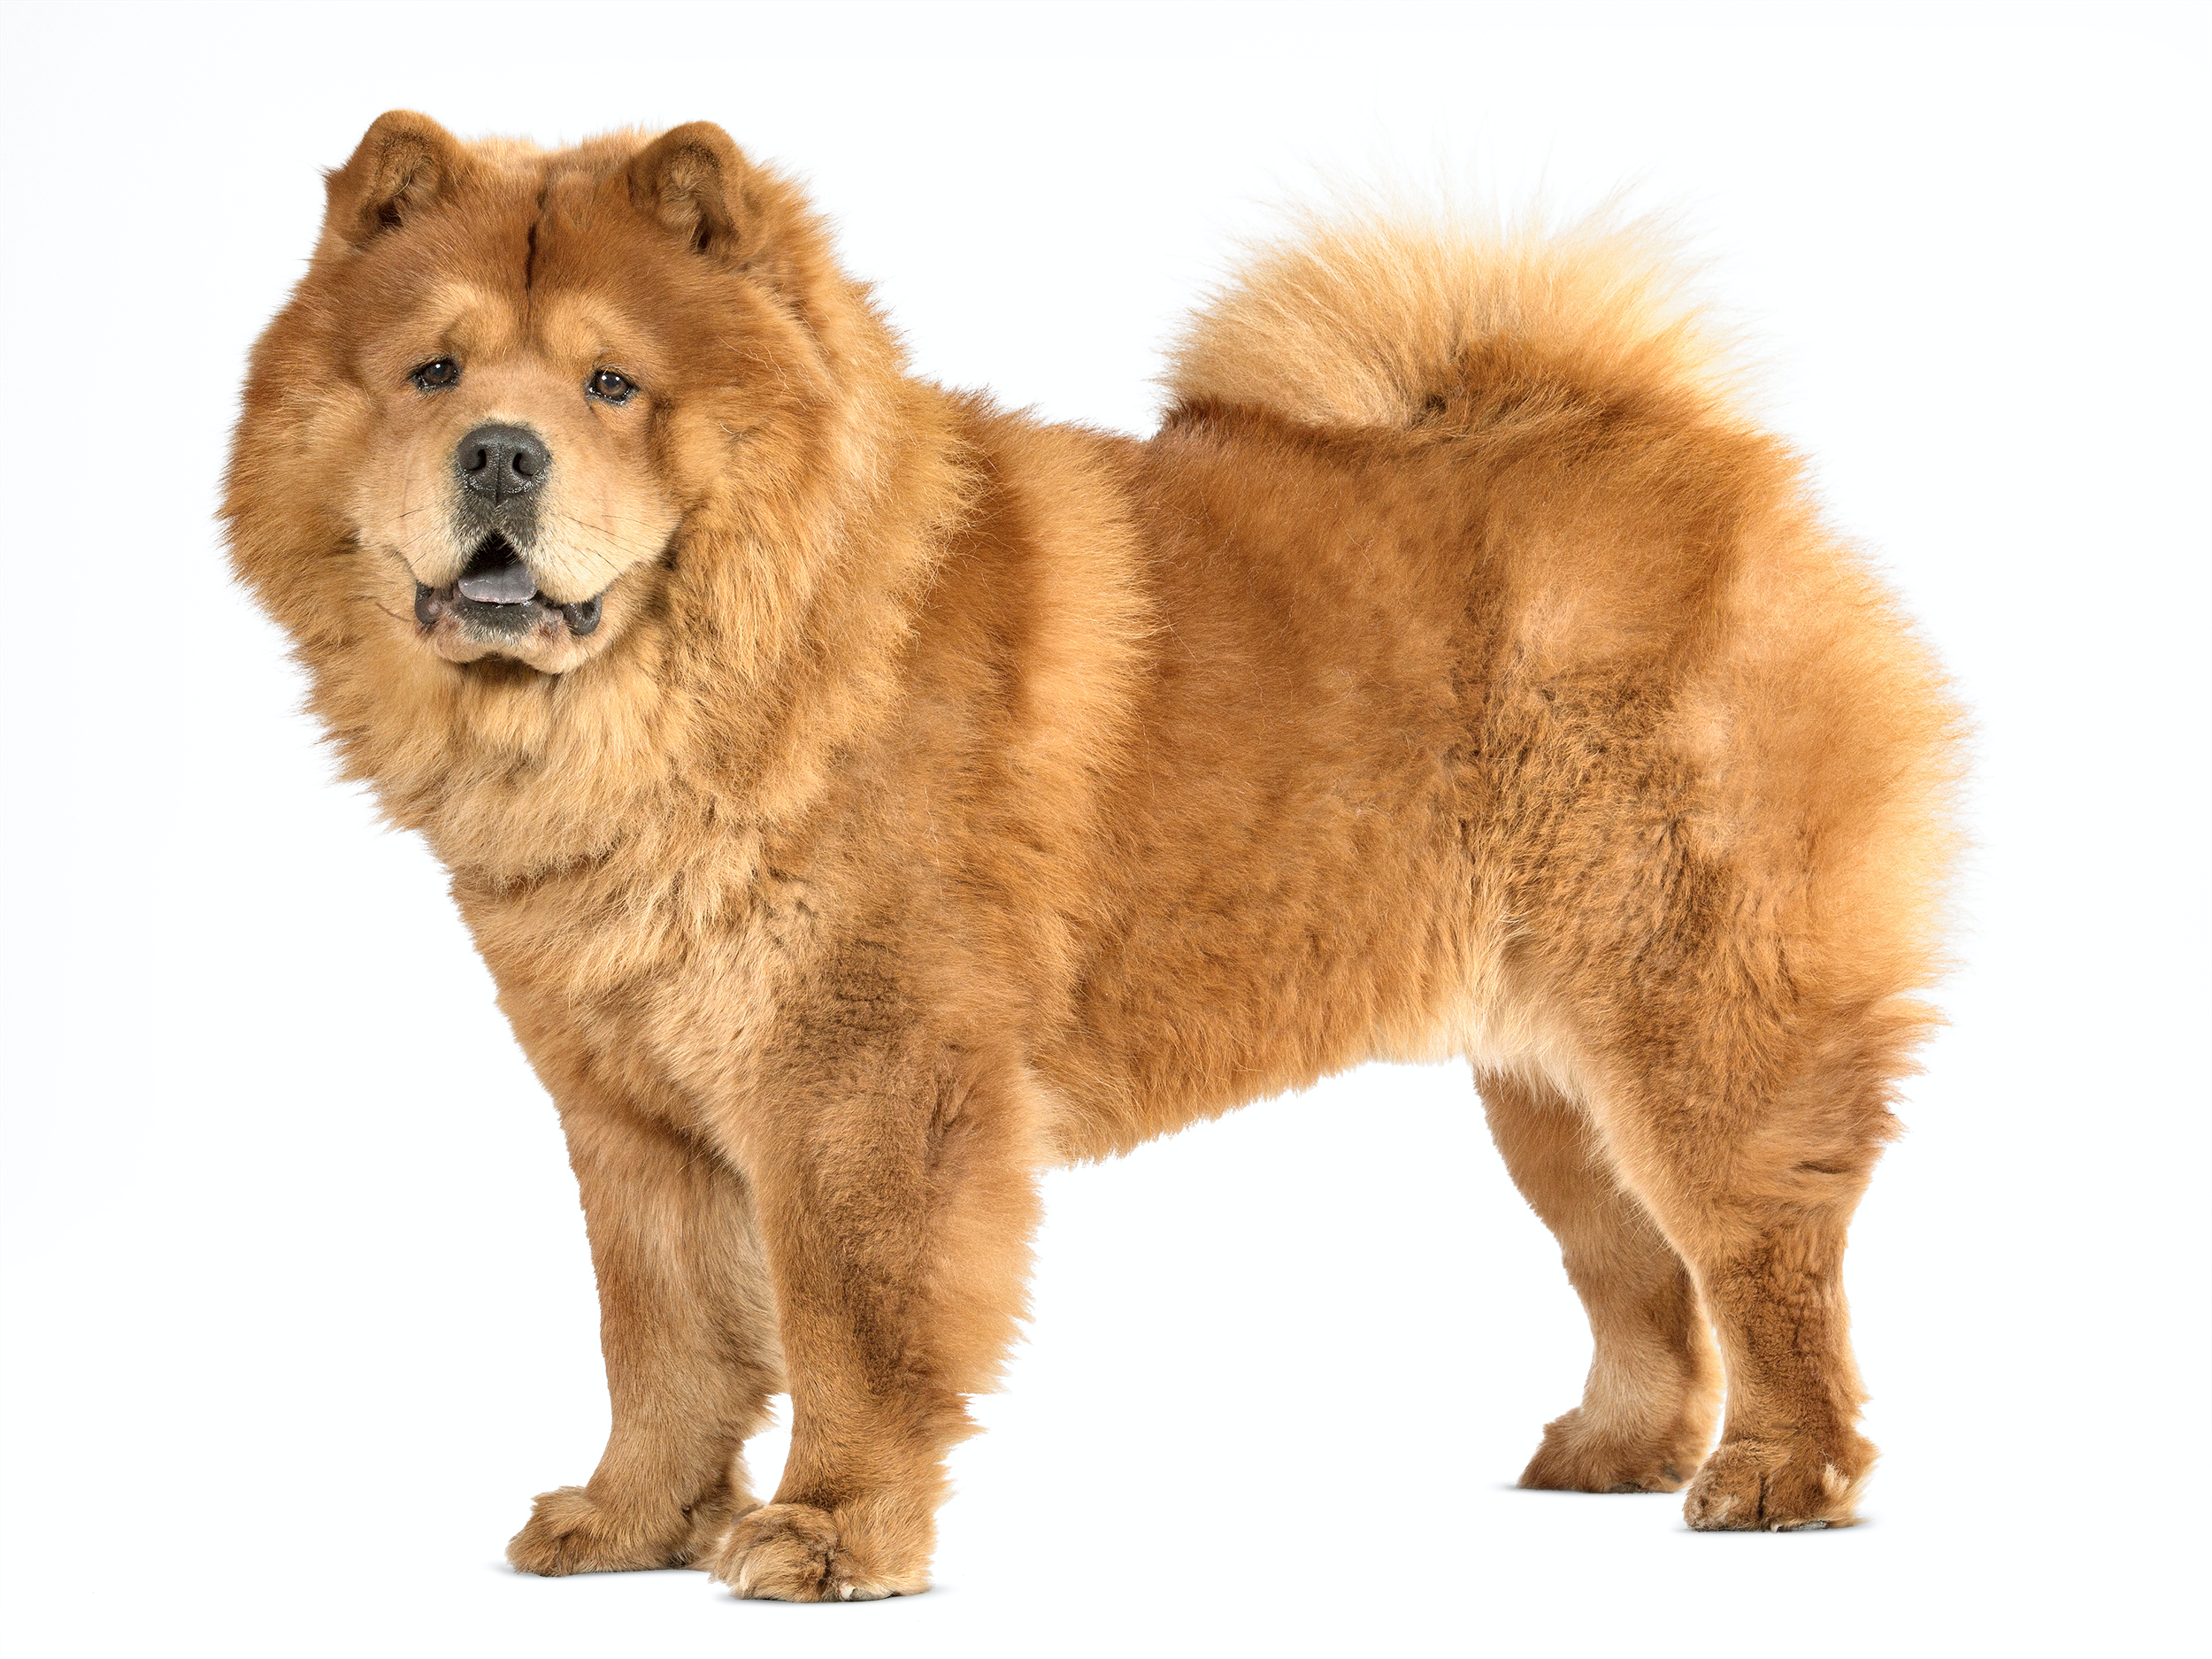 Daftar Ras Anjing Royal Canin